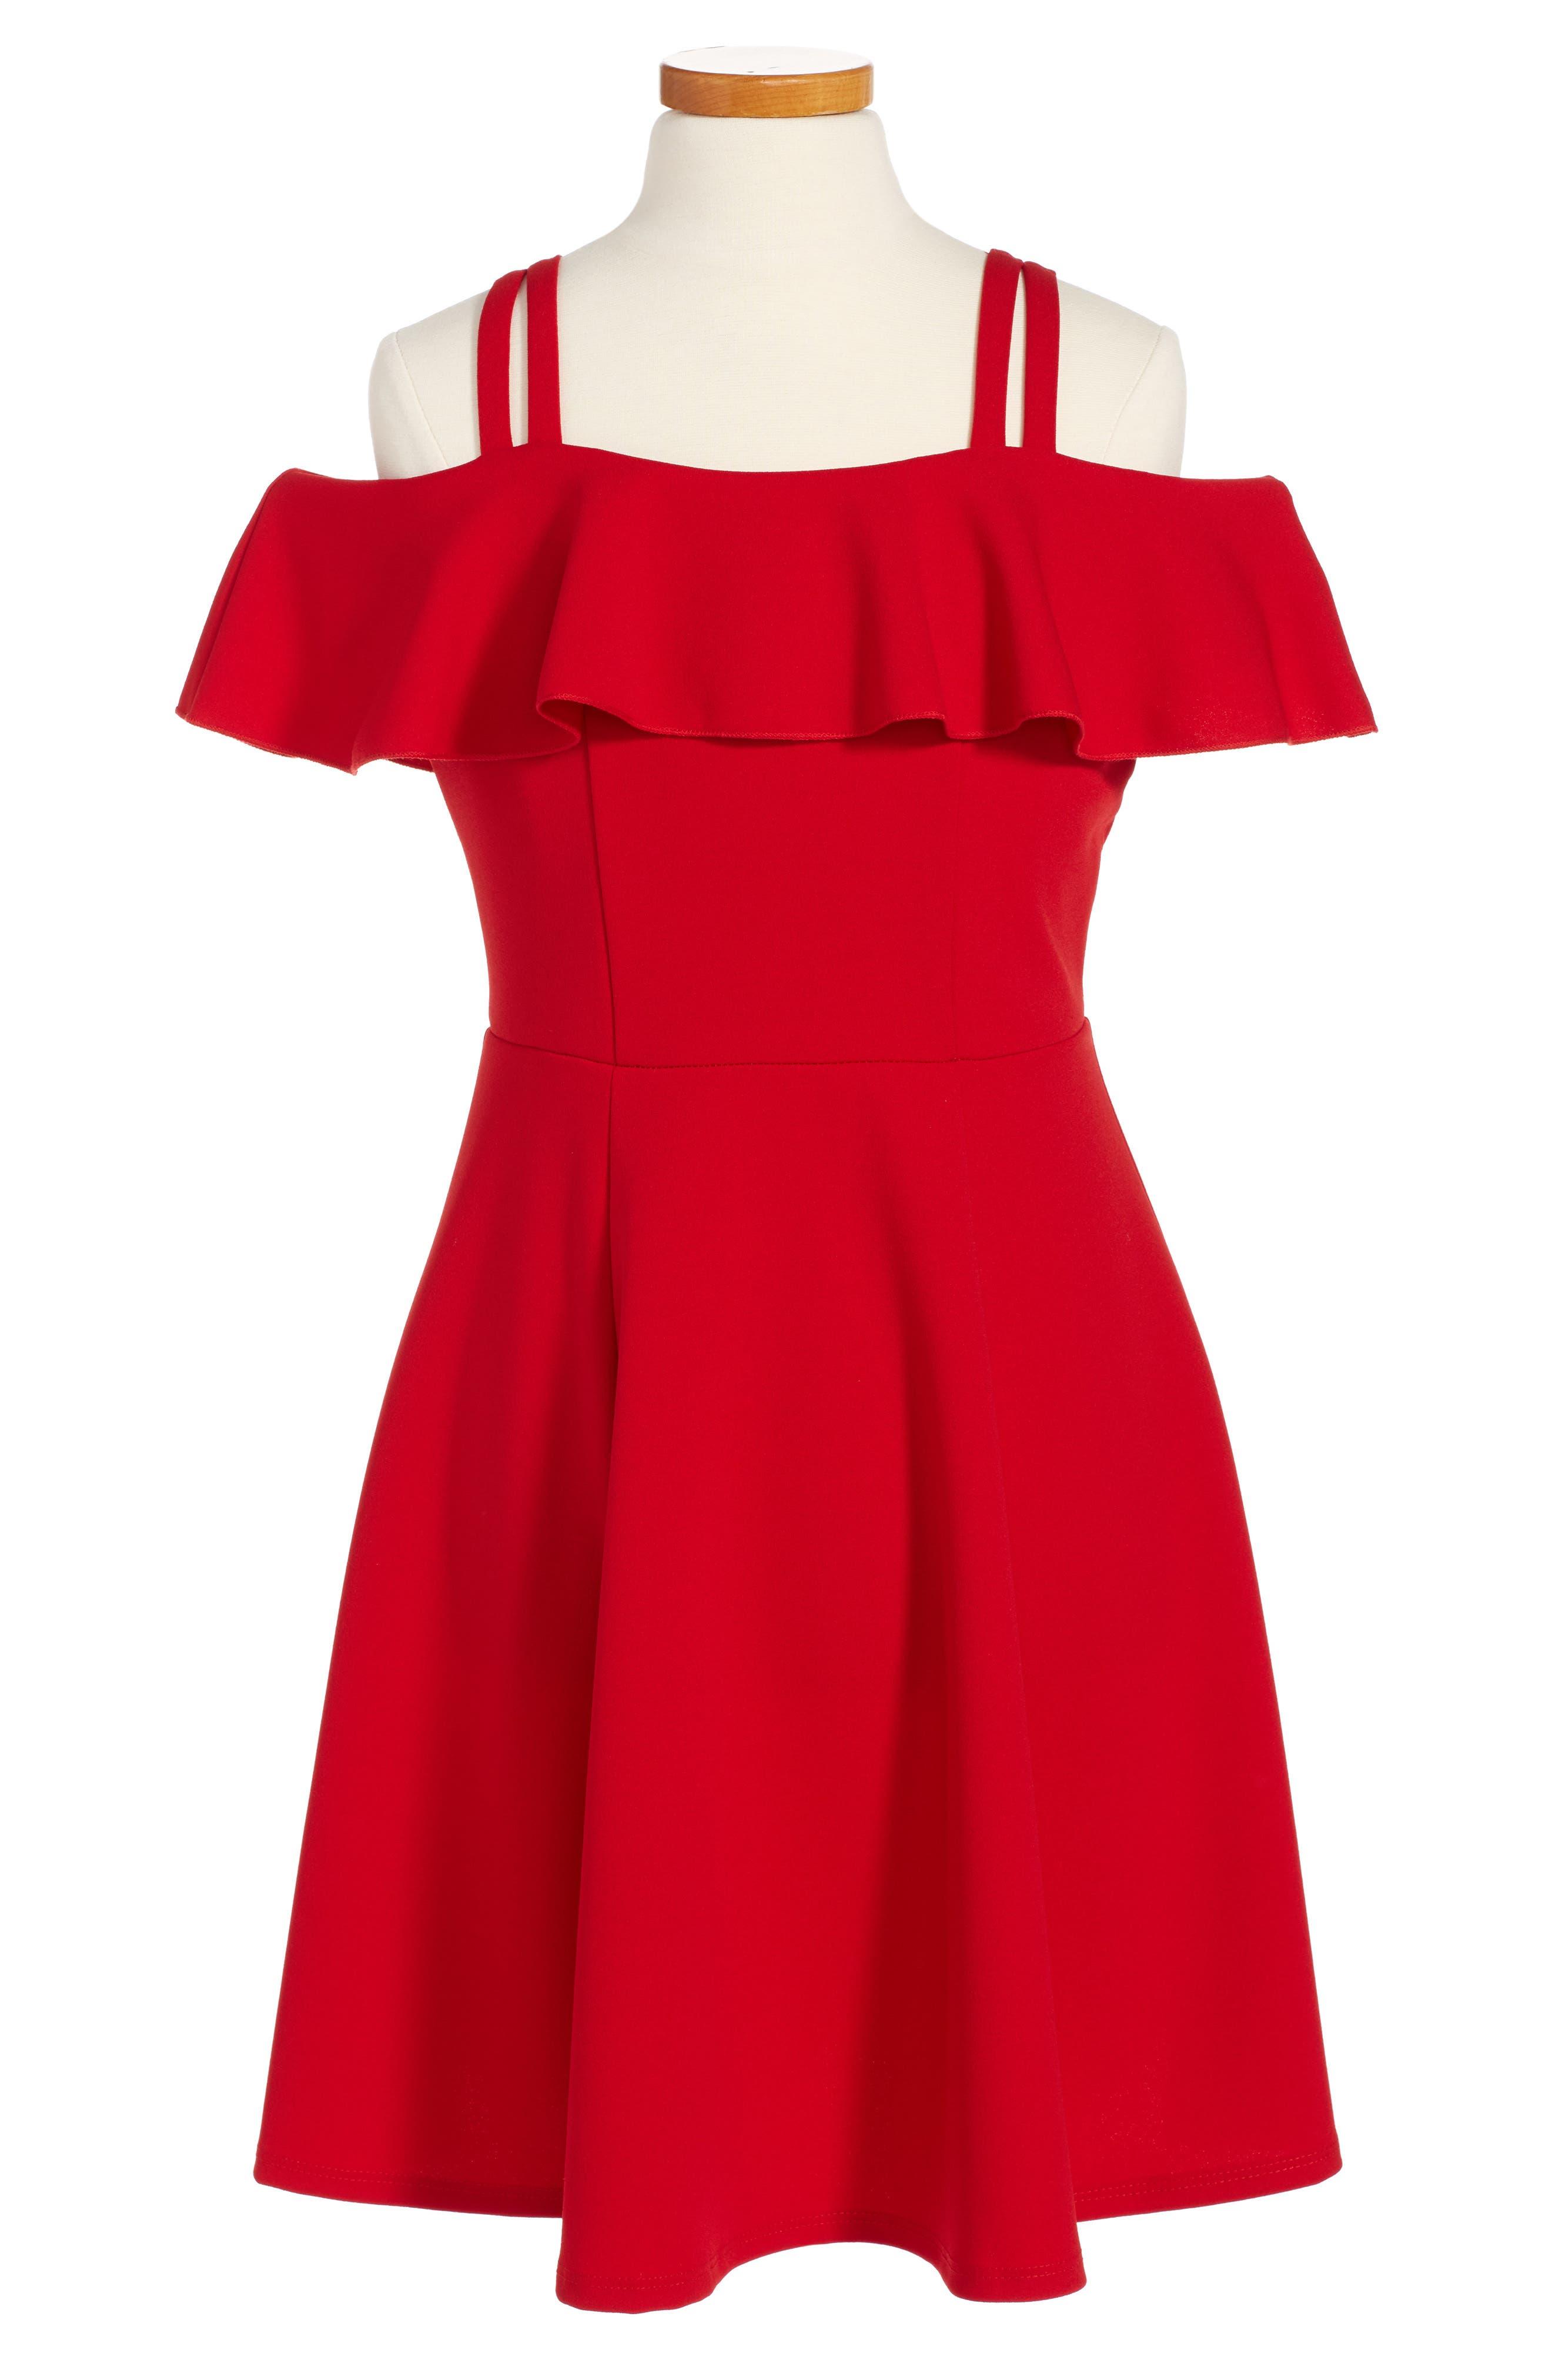 Alternate Image 1 Selected - Love, Nickie Lew Off the Shoulder Ruffle Dress (Big Girls)